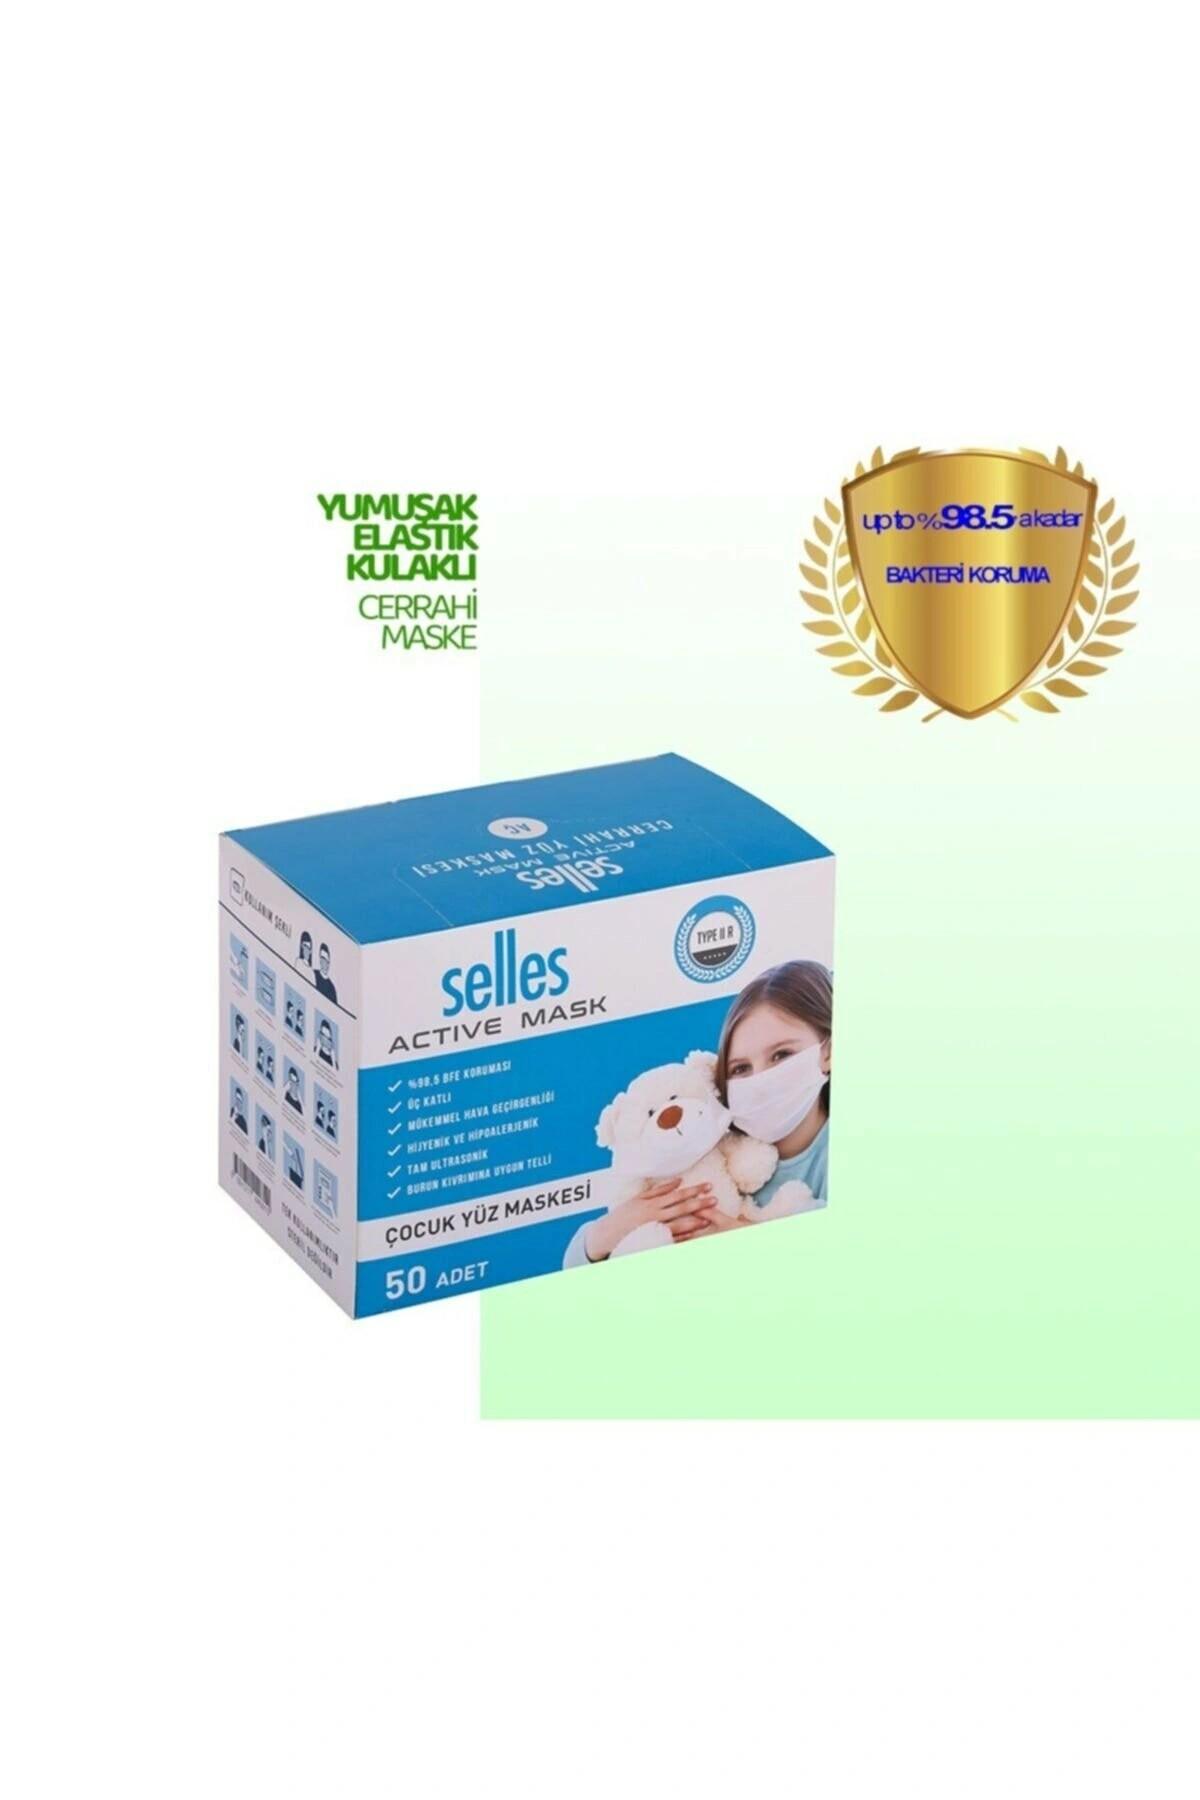 Melt.filtre Elastik Kulaklı 3 Katlı 250 Adet Cerrahi Çocuk Maskesi